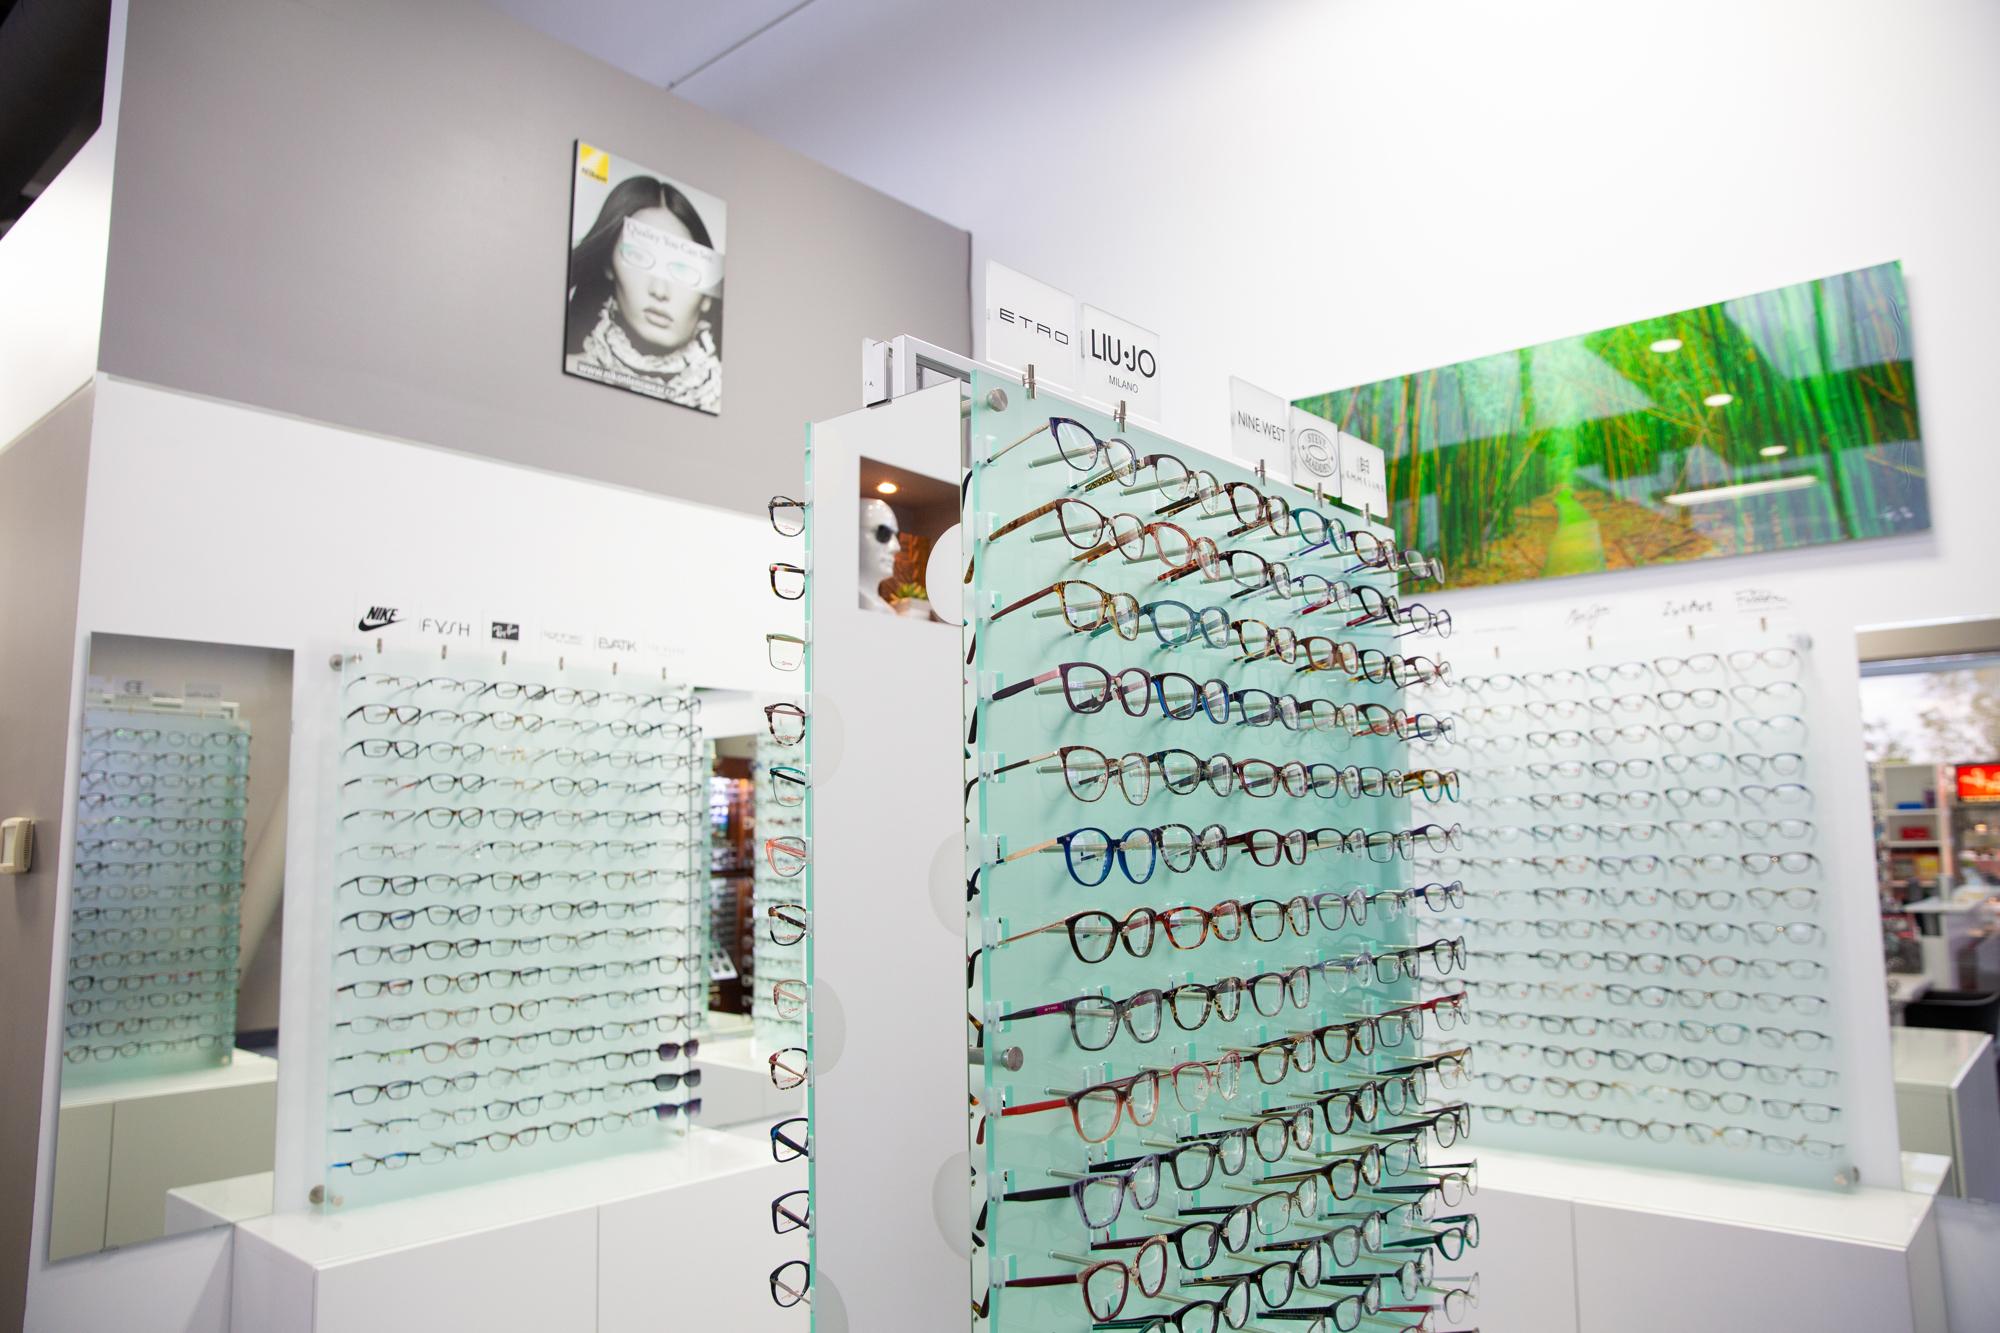 Century Vision Care 002